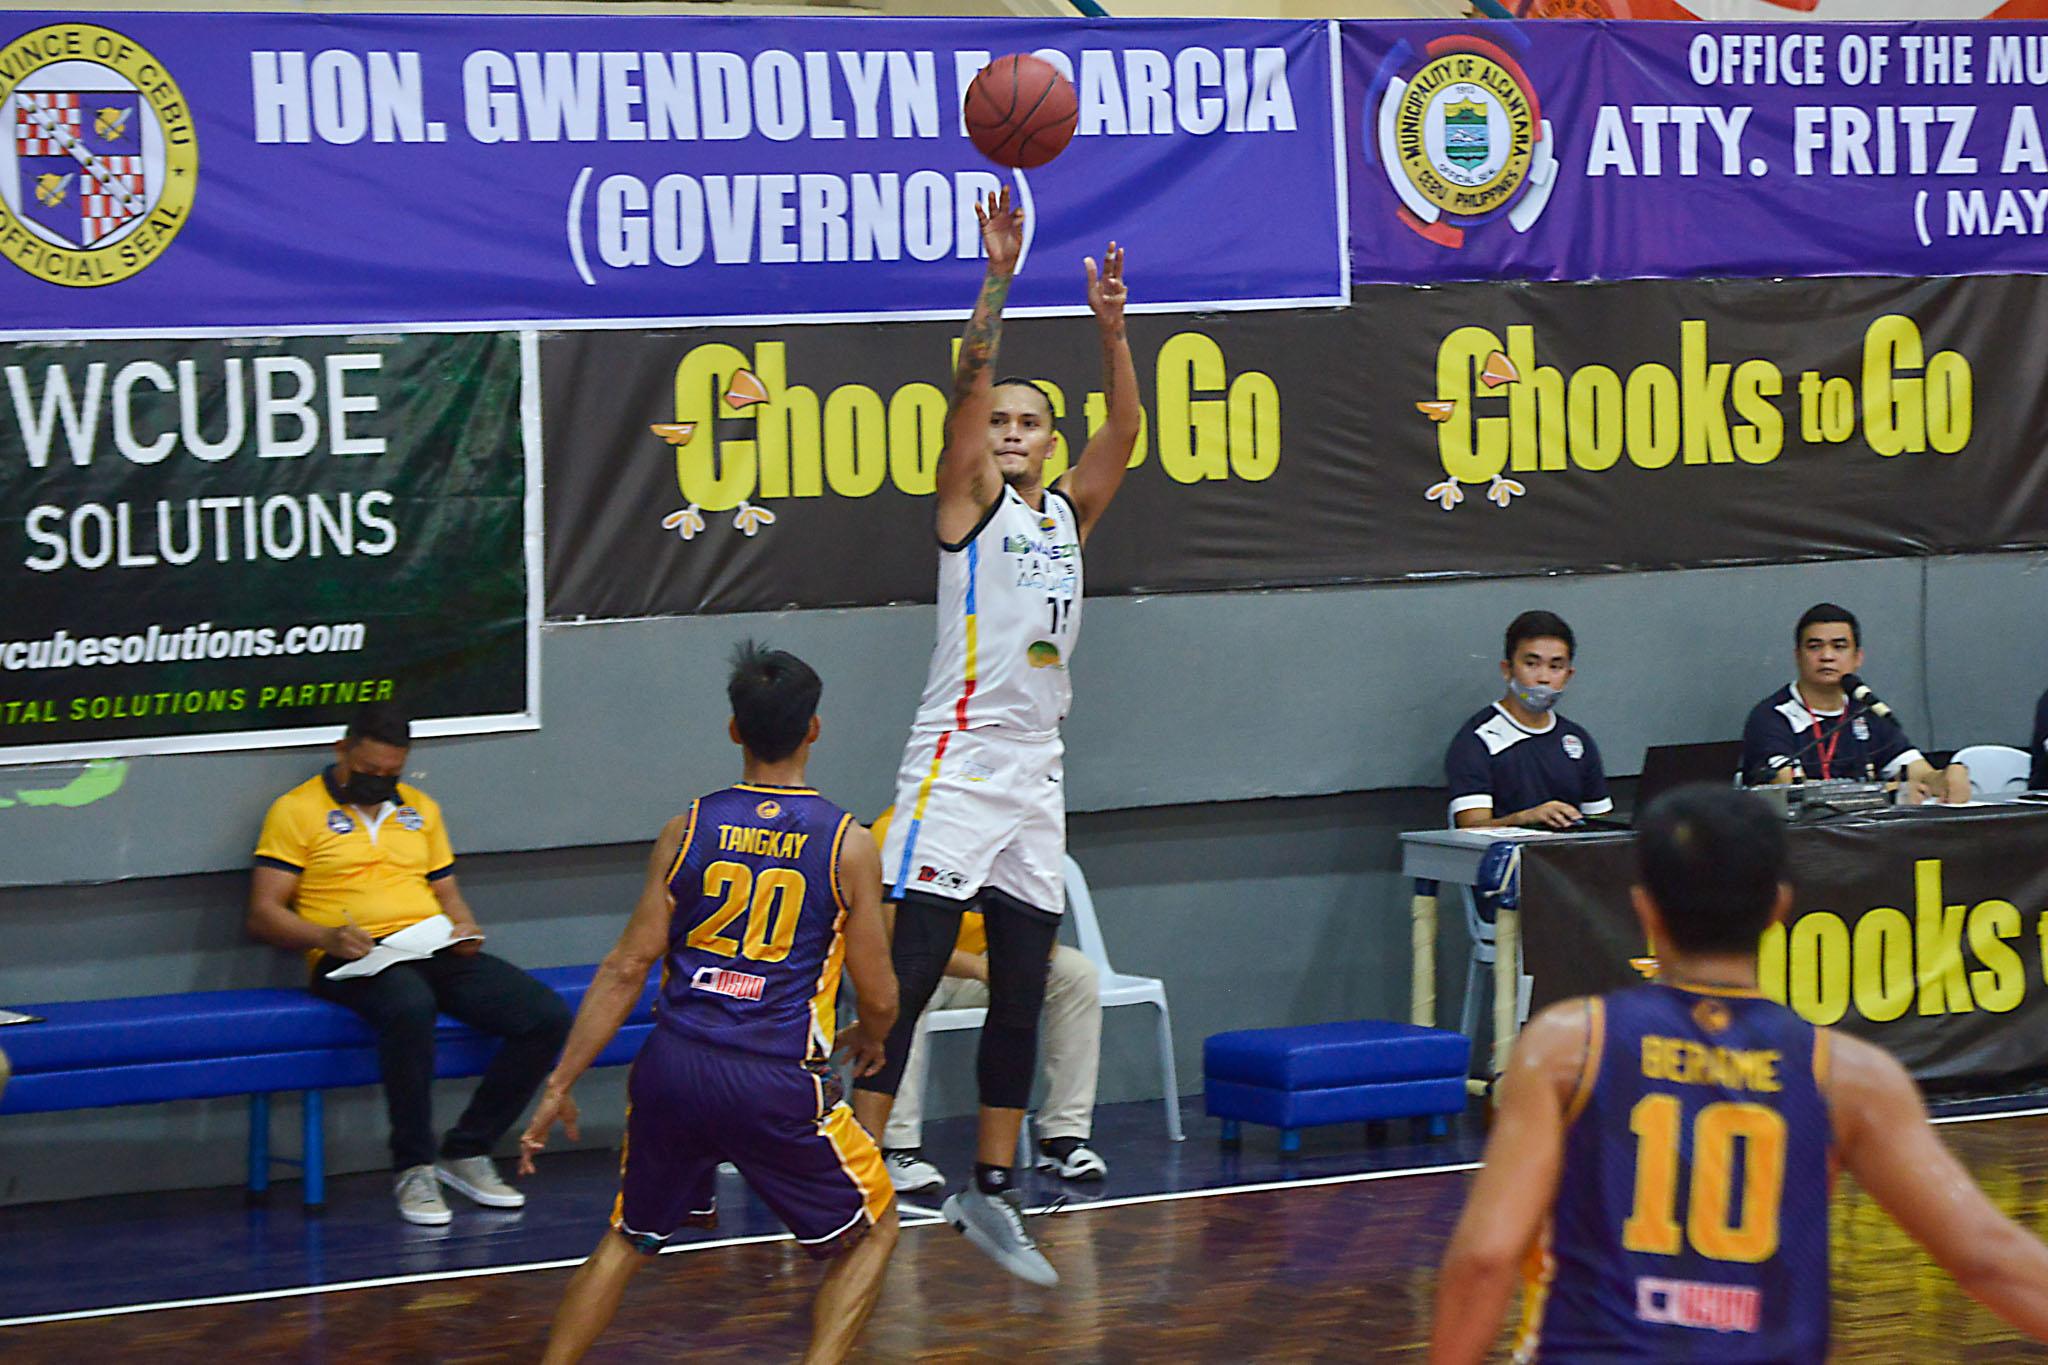 2021-Chooks-to-Go-VisMin-Cup-Talisay-vs-Lapu-Lapu-Patrick-Cabahug-2 MJAS-Talisay completes 10-0 elims sweep, earns VisMin-Visayas finals berth Basketball News VisMin Super Cup  - philippine sports news